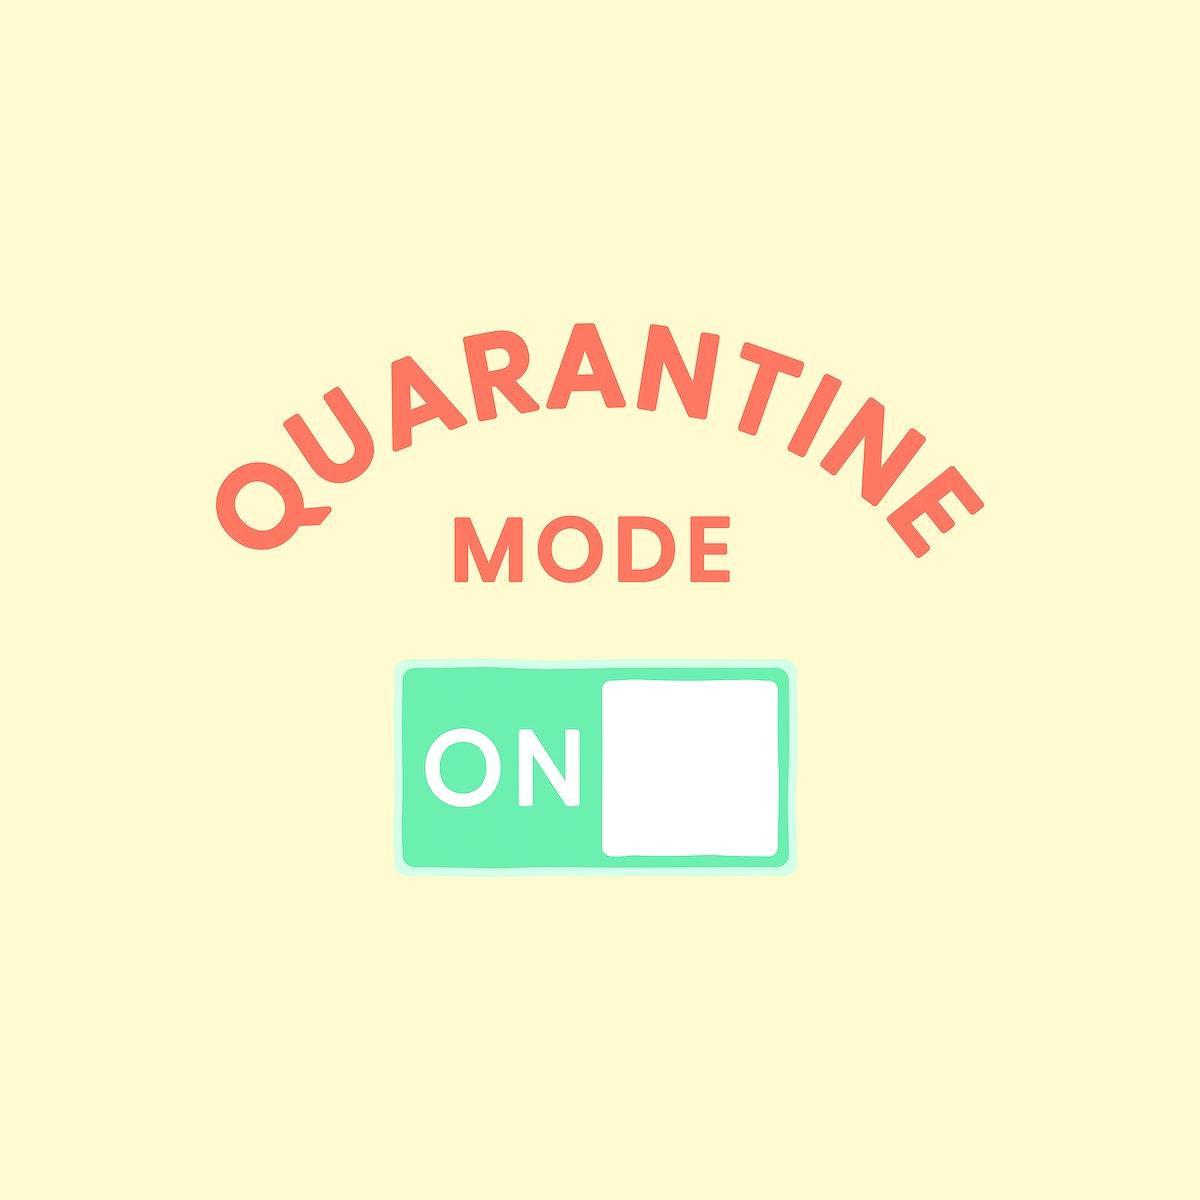 Quarantine mode on during coronavirus pandemic element vector